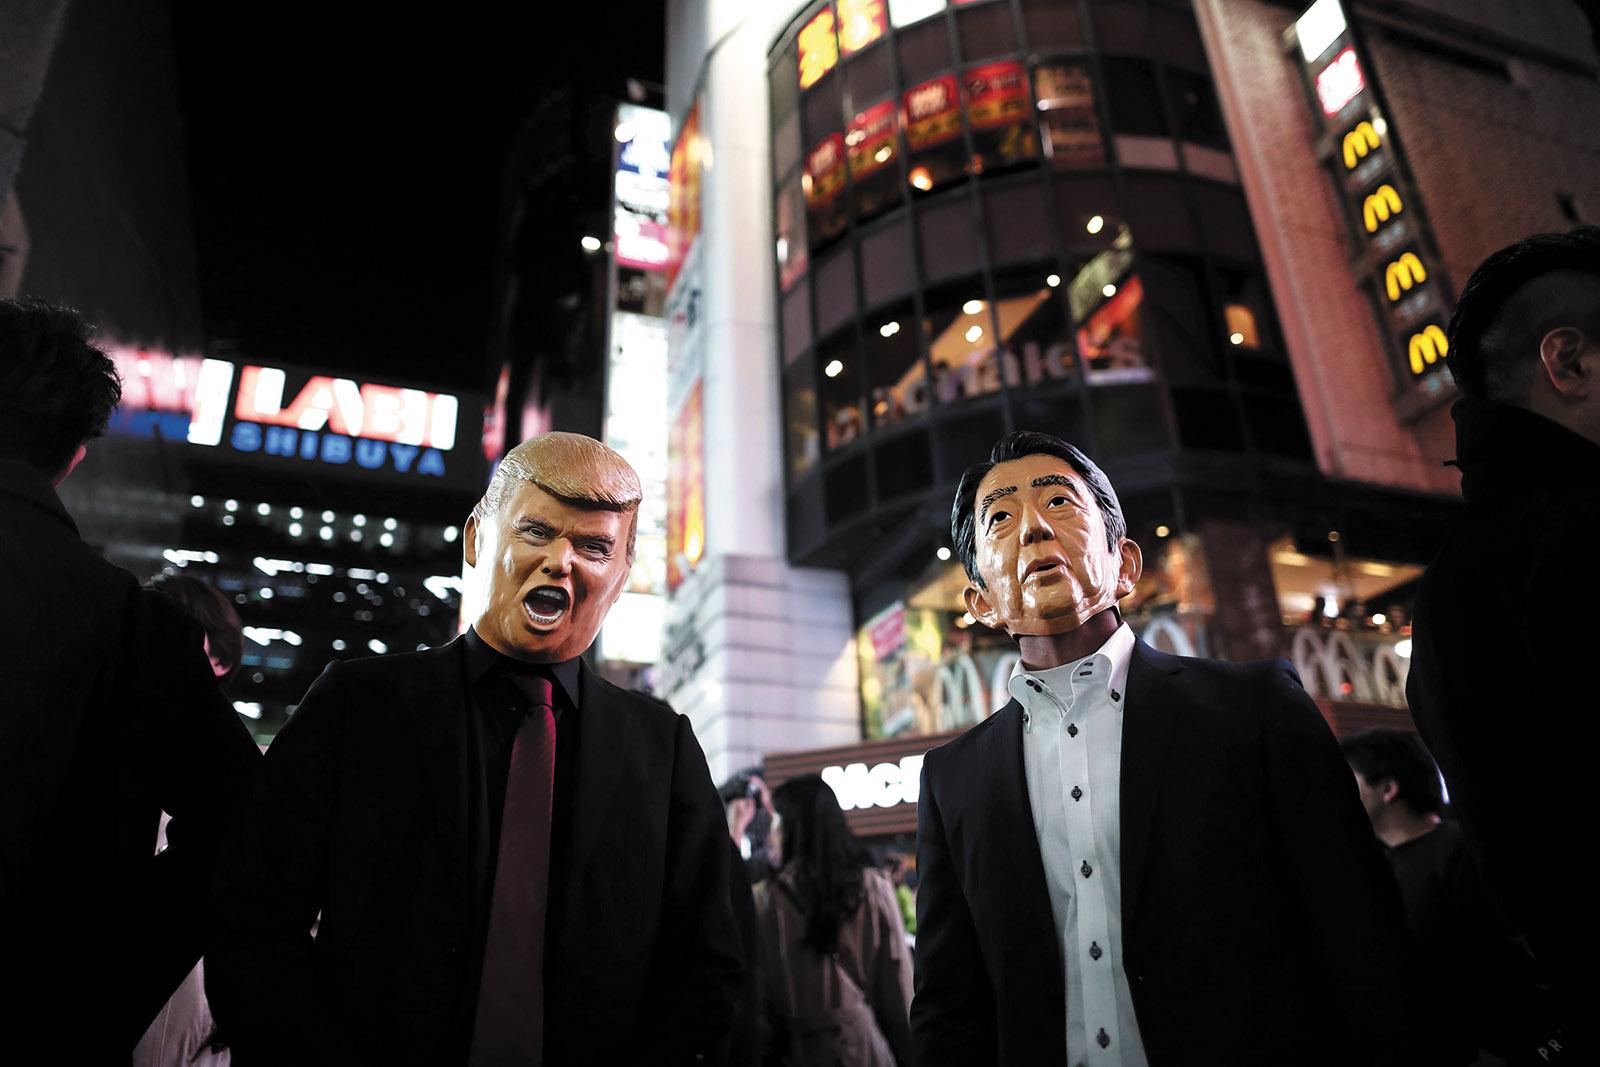 Masks of Donald Trump and Shinzo Abe worn at a Halloween parade in Tokyo, October 2017